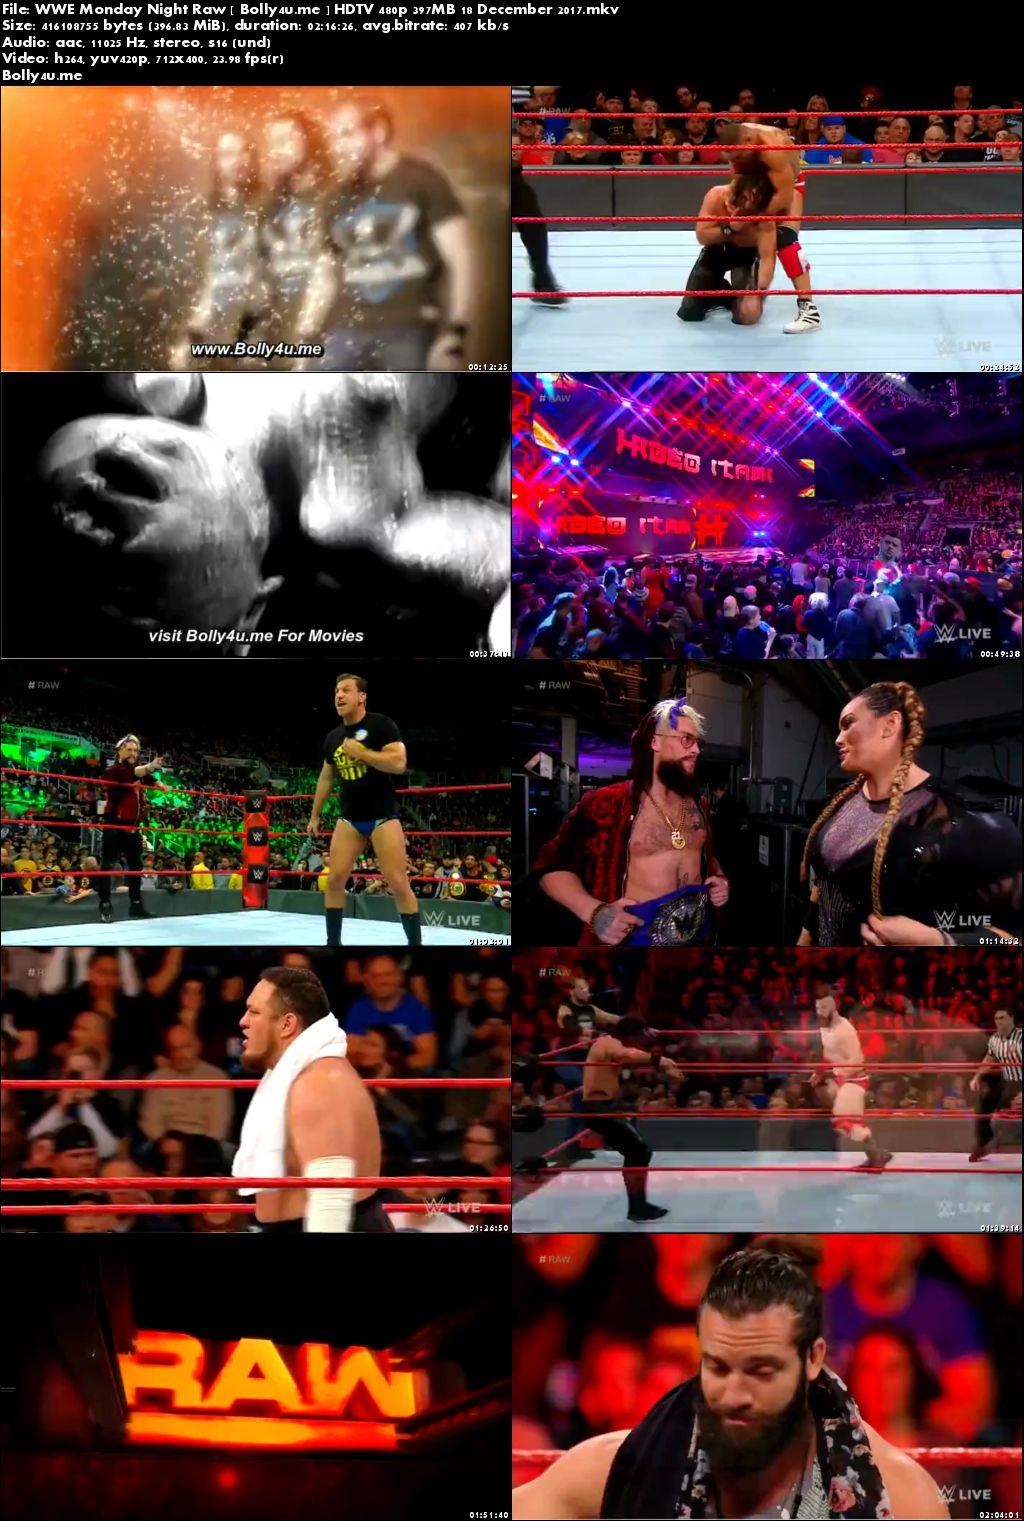 WWE Monday Night Raw HDTV 480p 400MB 18 December 2017 Download